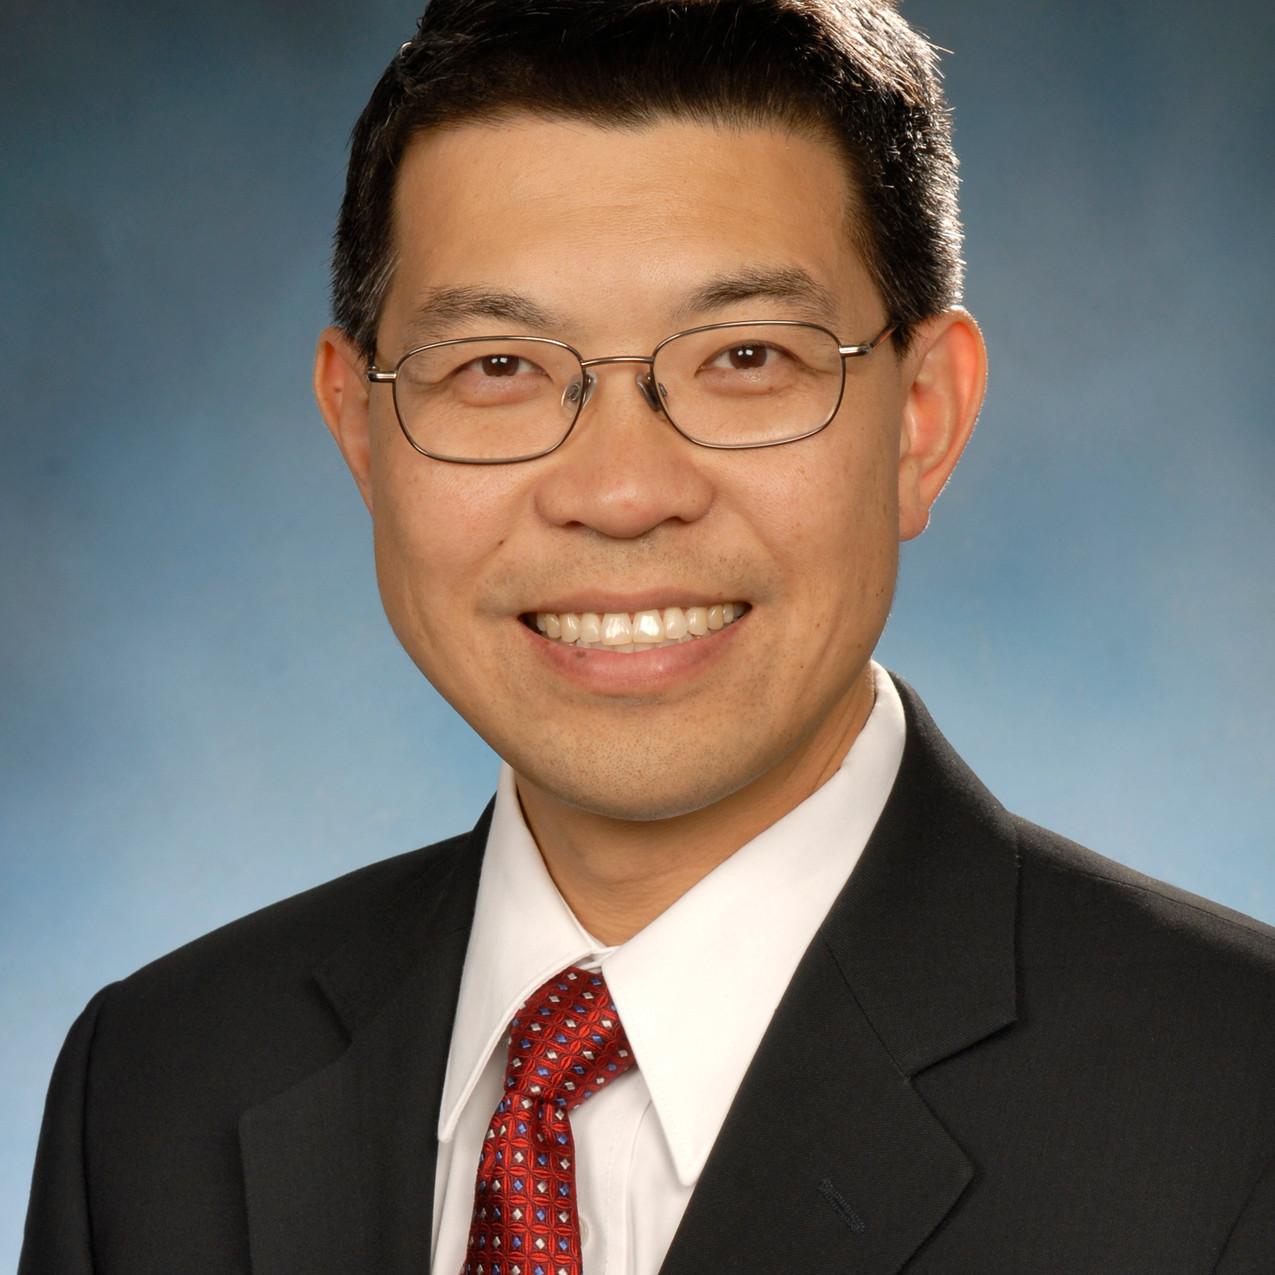 Dr. Bennie Jeng